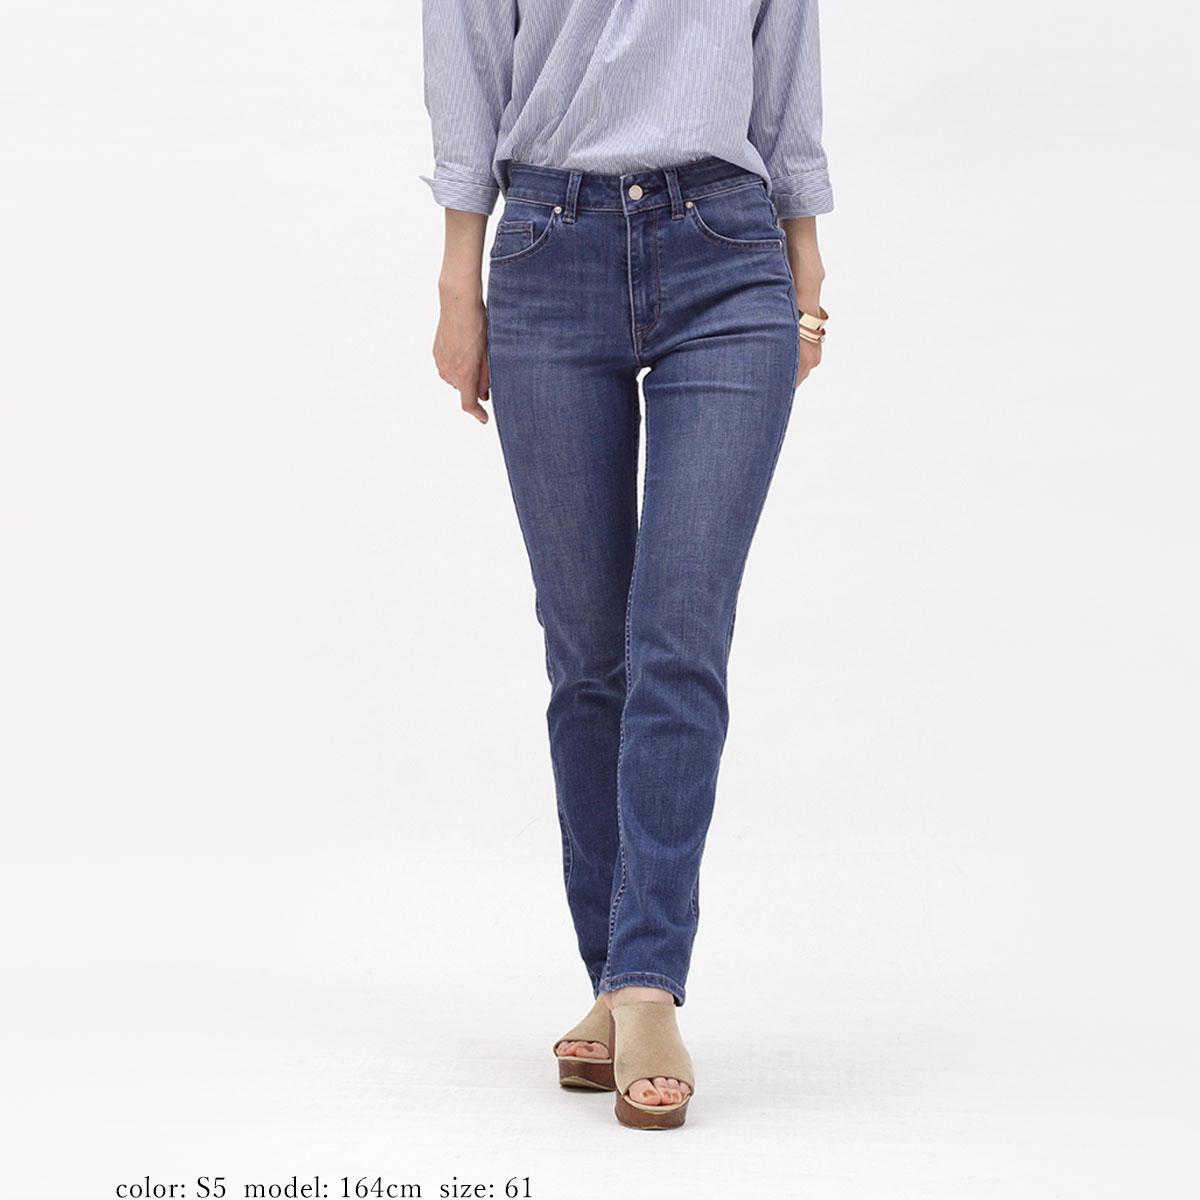 【SALE】Mrs.Jeana ■涼■サマーストレート MJ4622